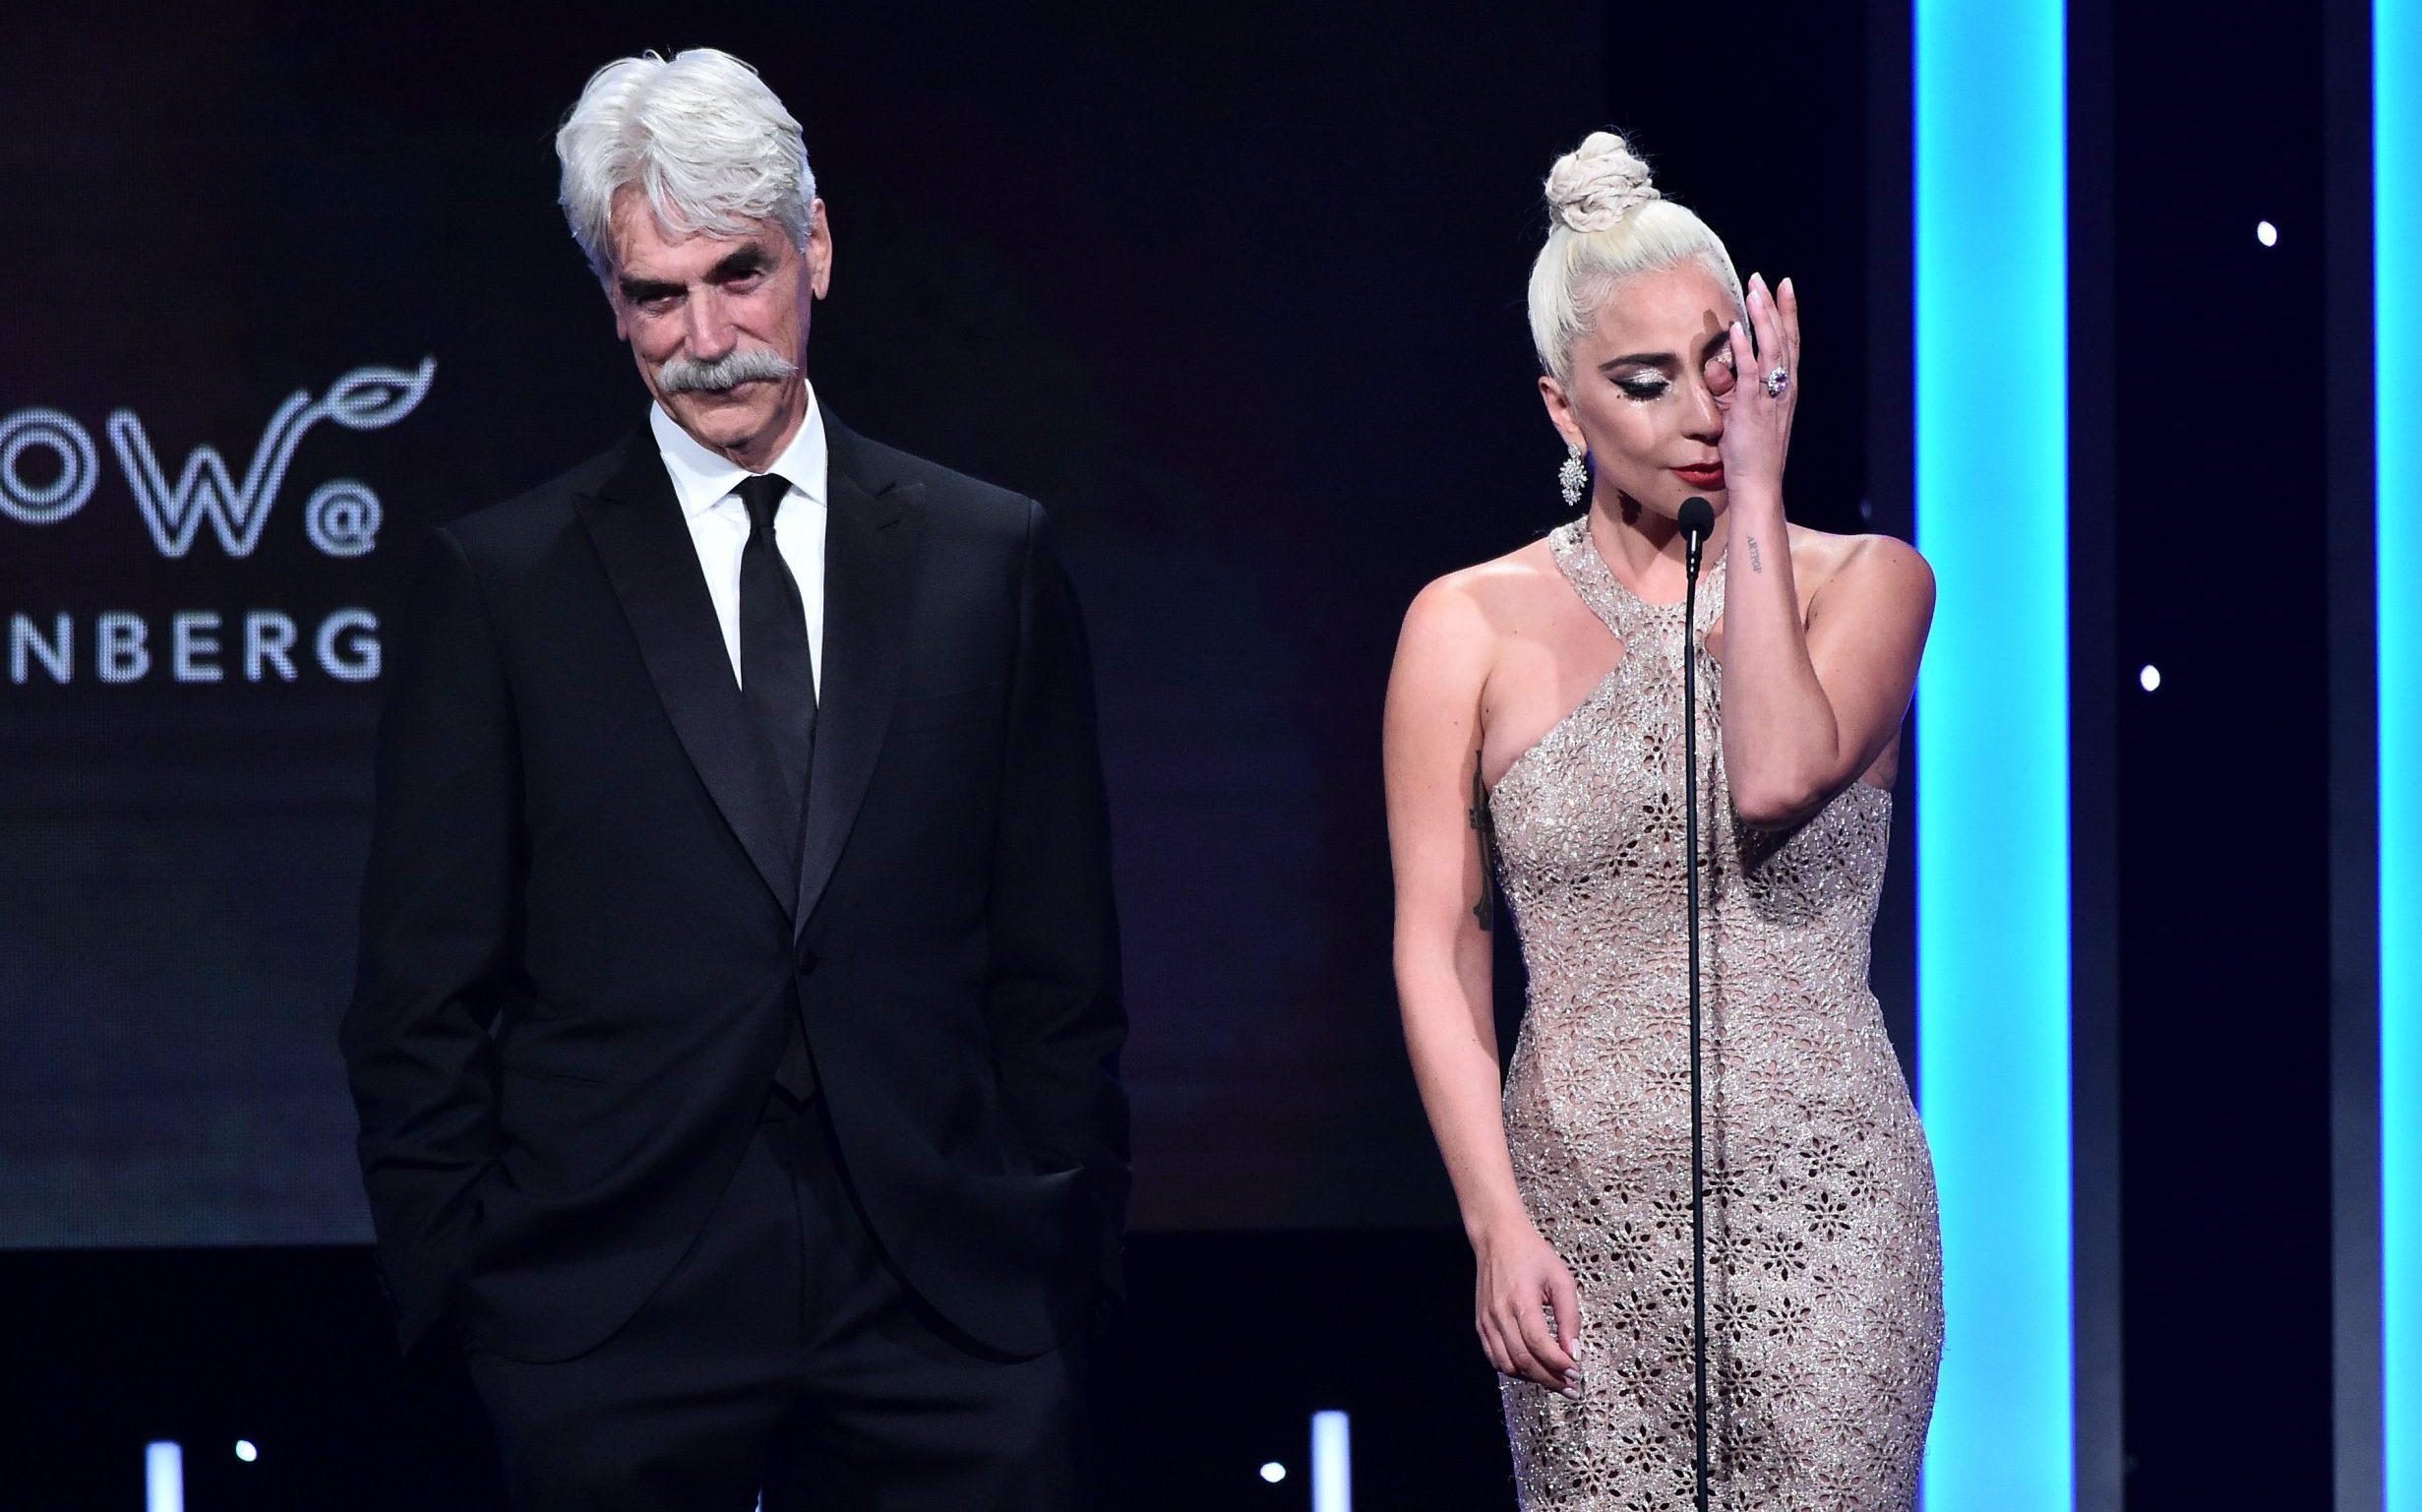 Mandatory Credit: Photo by Michael Buckner/Variety/REX (10003849cm) Sam Elliott and Lady Gaga 32nd Annual Cinematheque Award honoring Bradley Cooper, Show, Los Angeles, USA